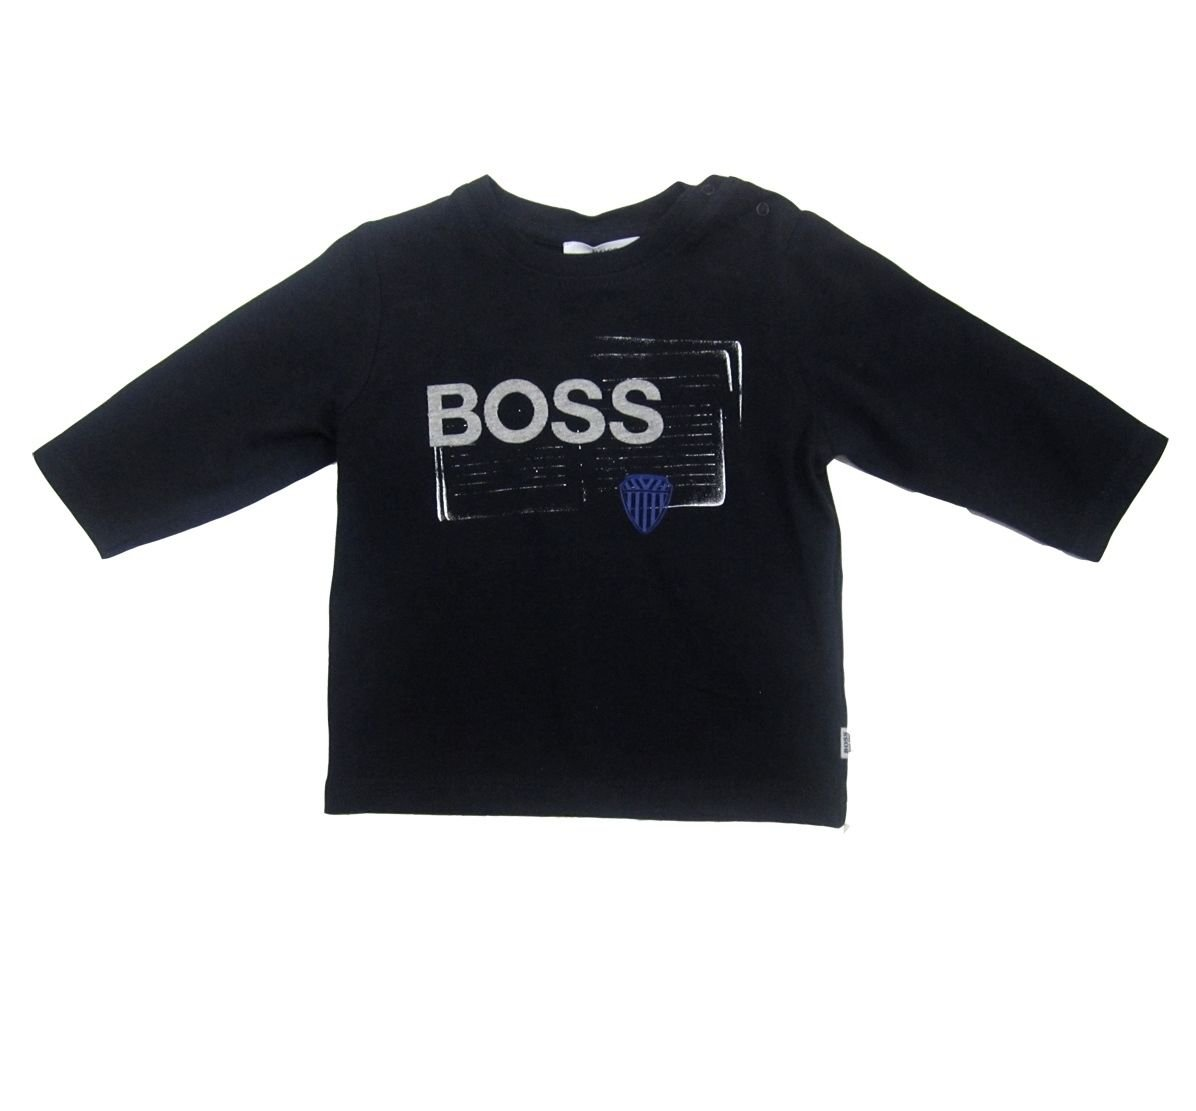 Boss Navy Top